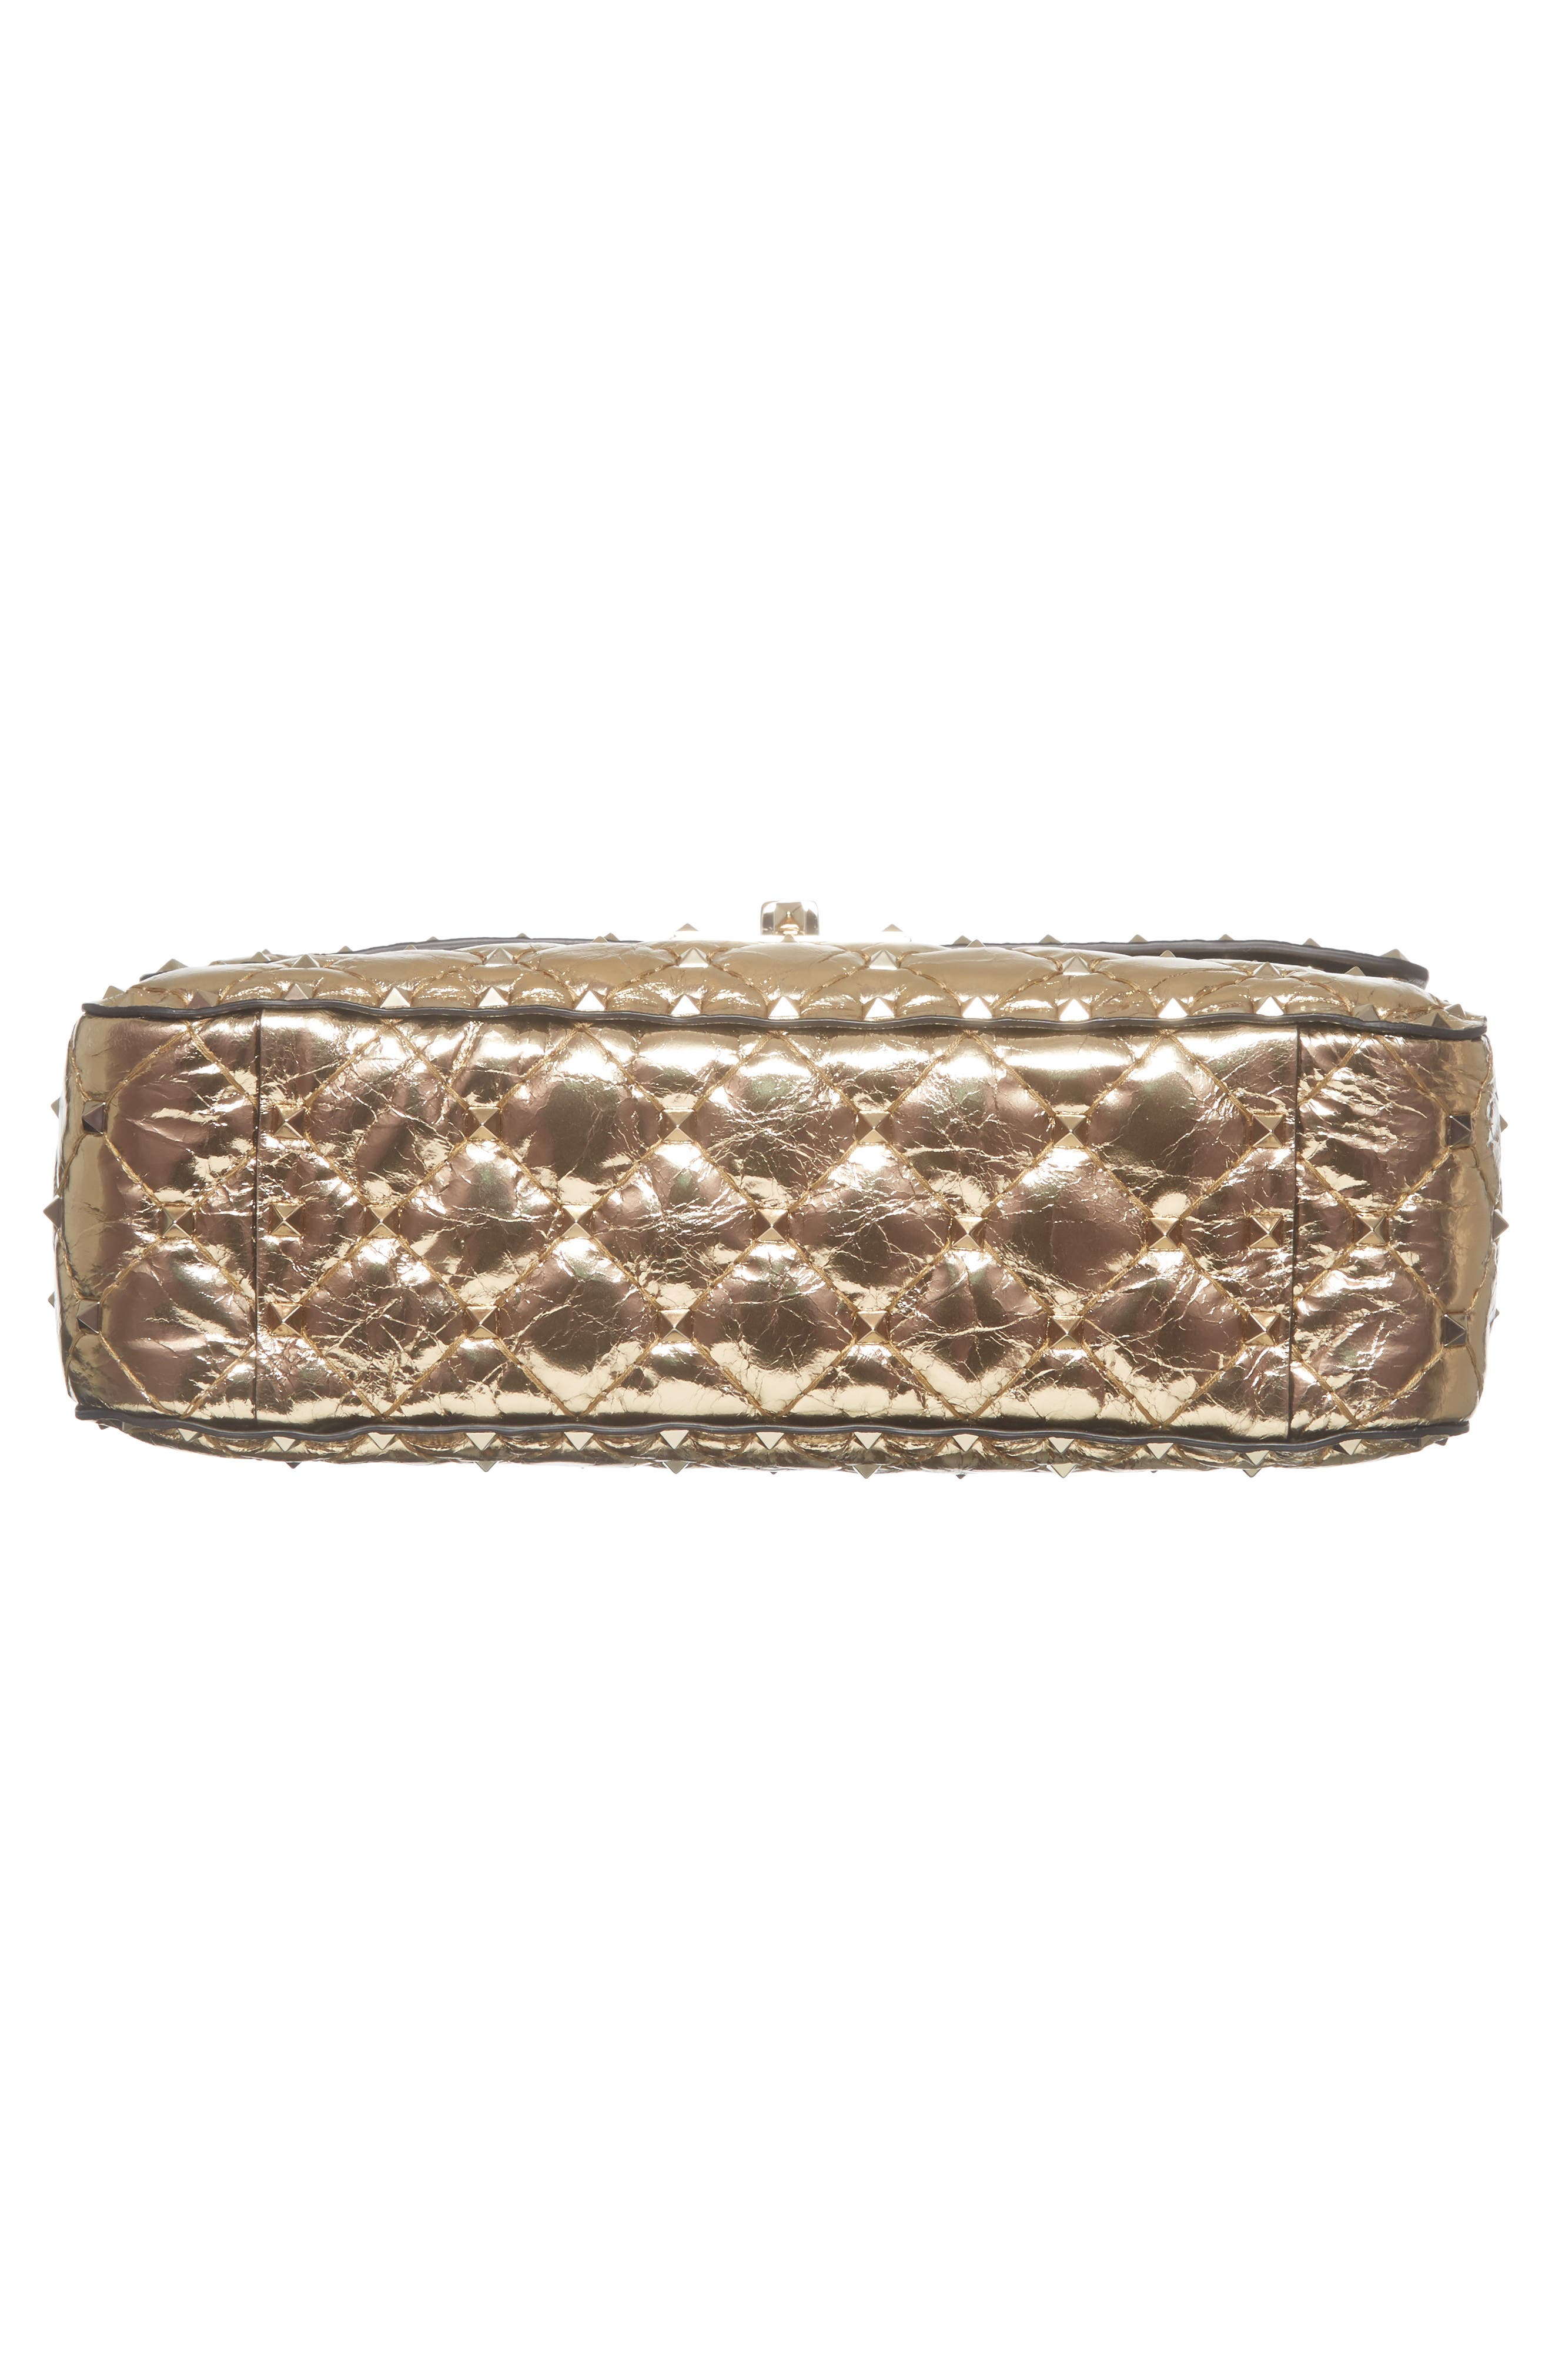 Matelassé Rockstud Spike Leather Top Handle Bag,                             Alternate thumbnail 6, color,                             MEKONG